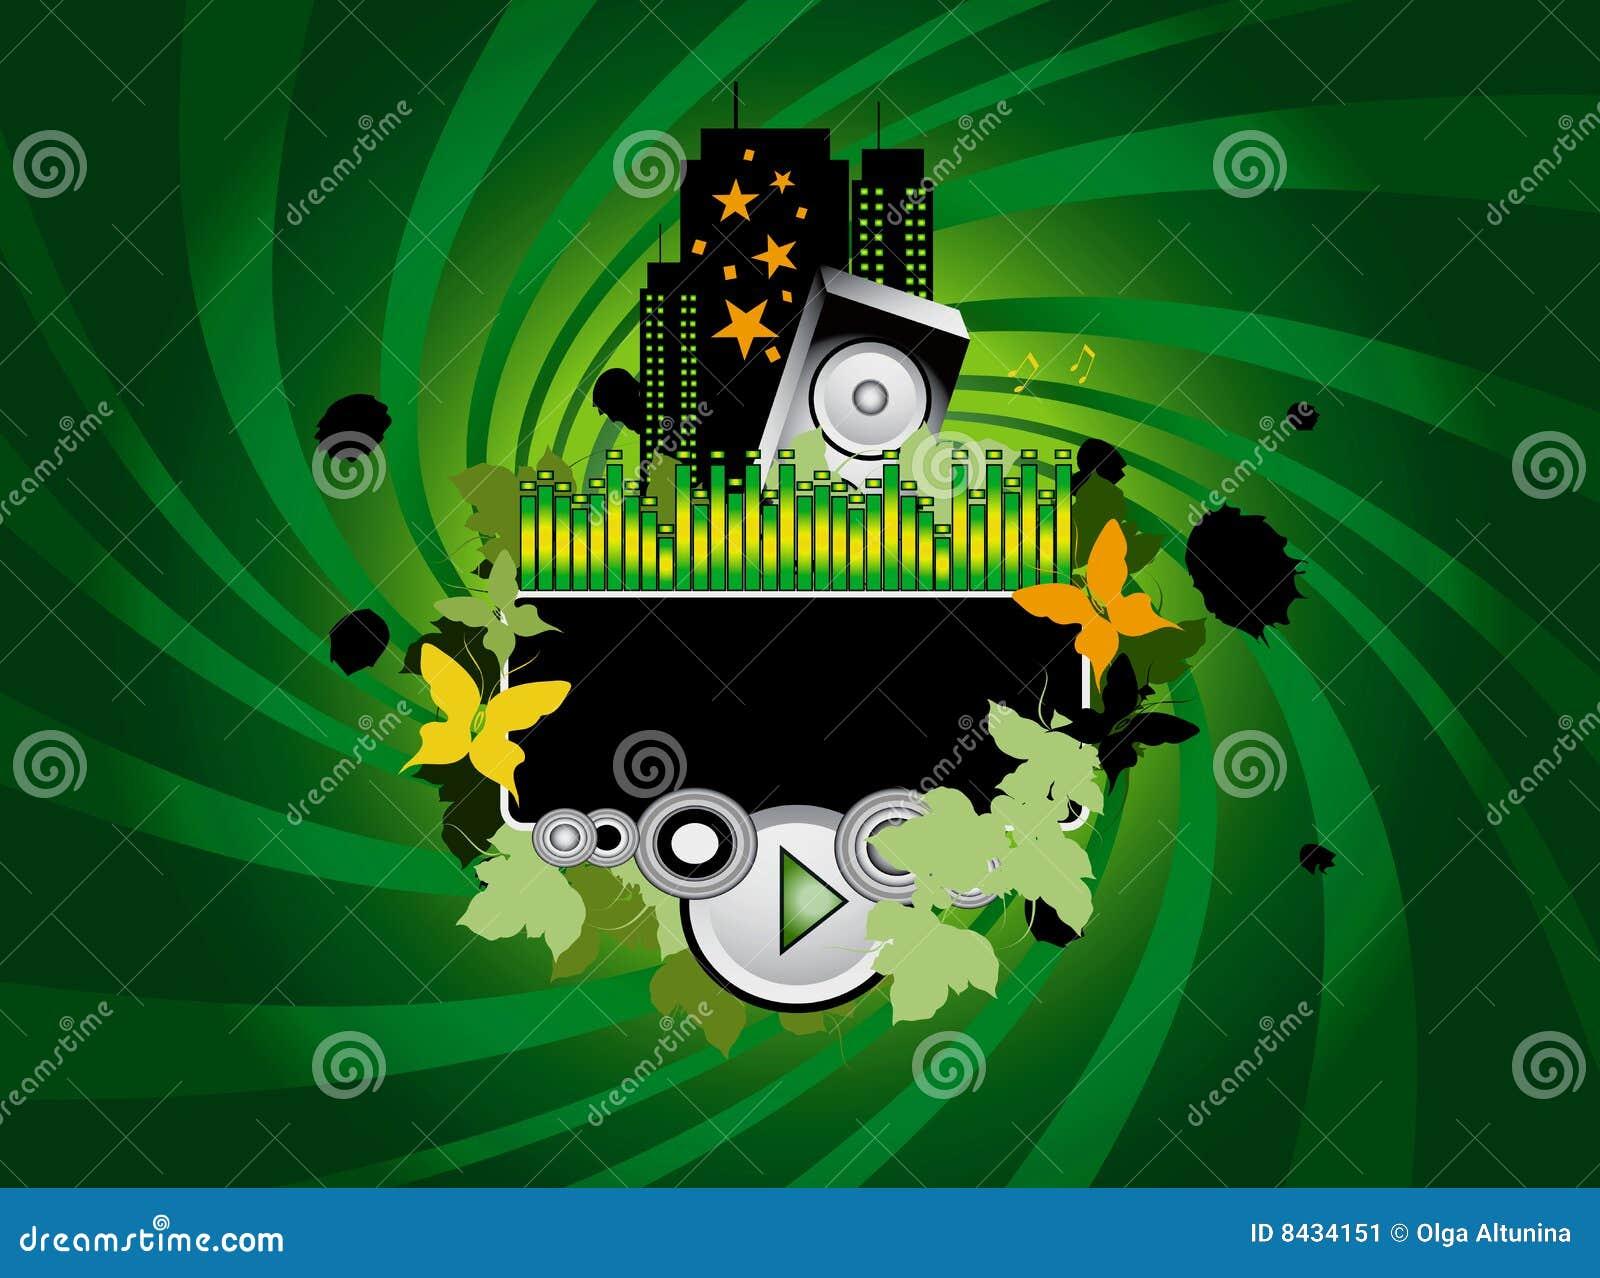 Green Music Background